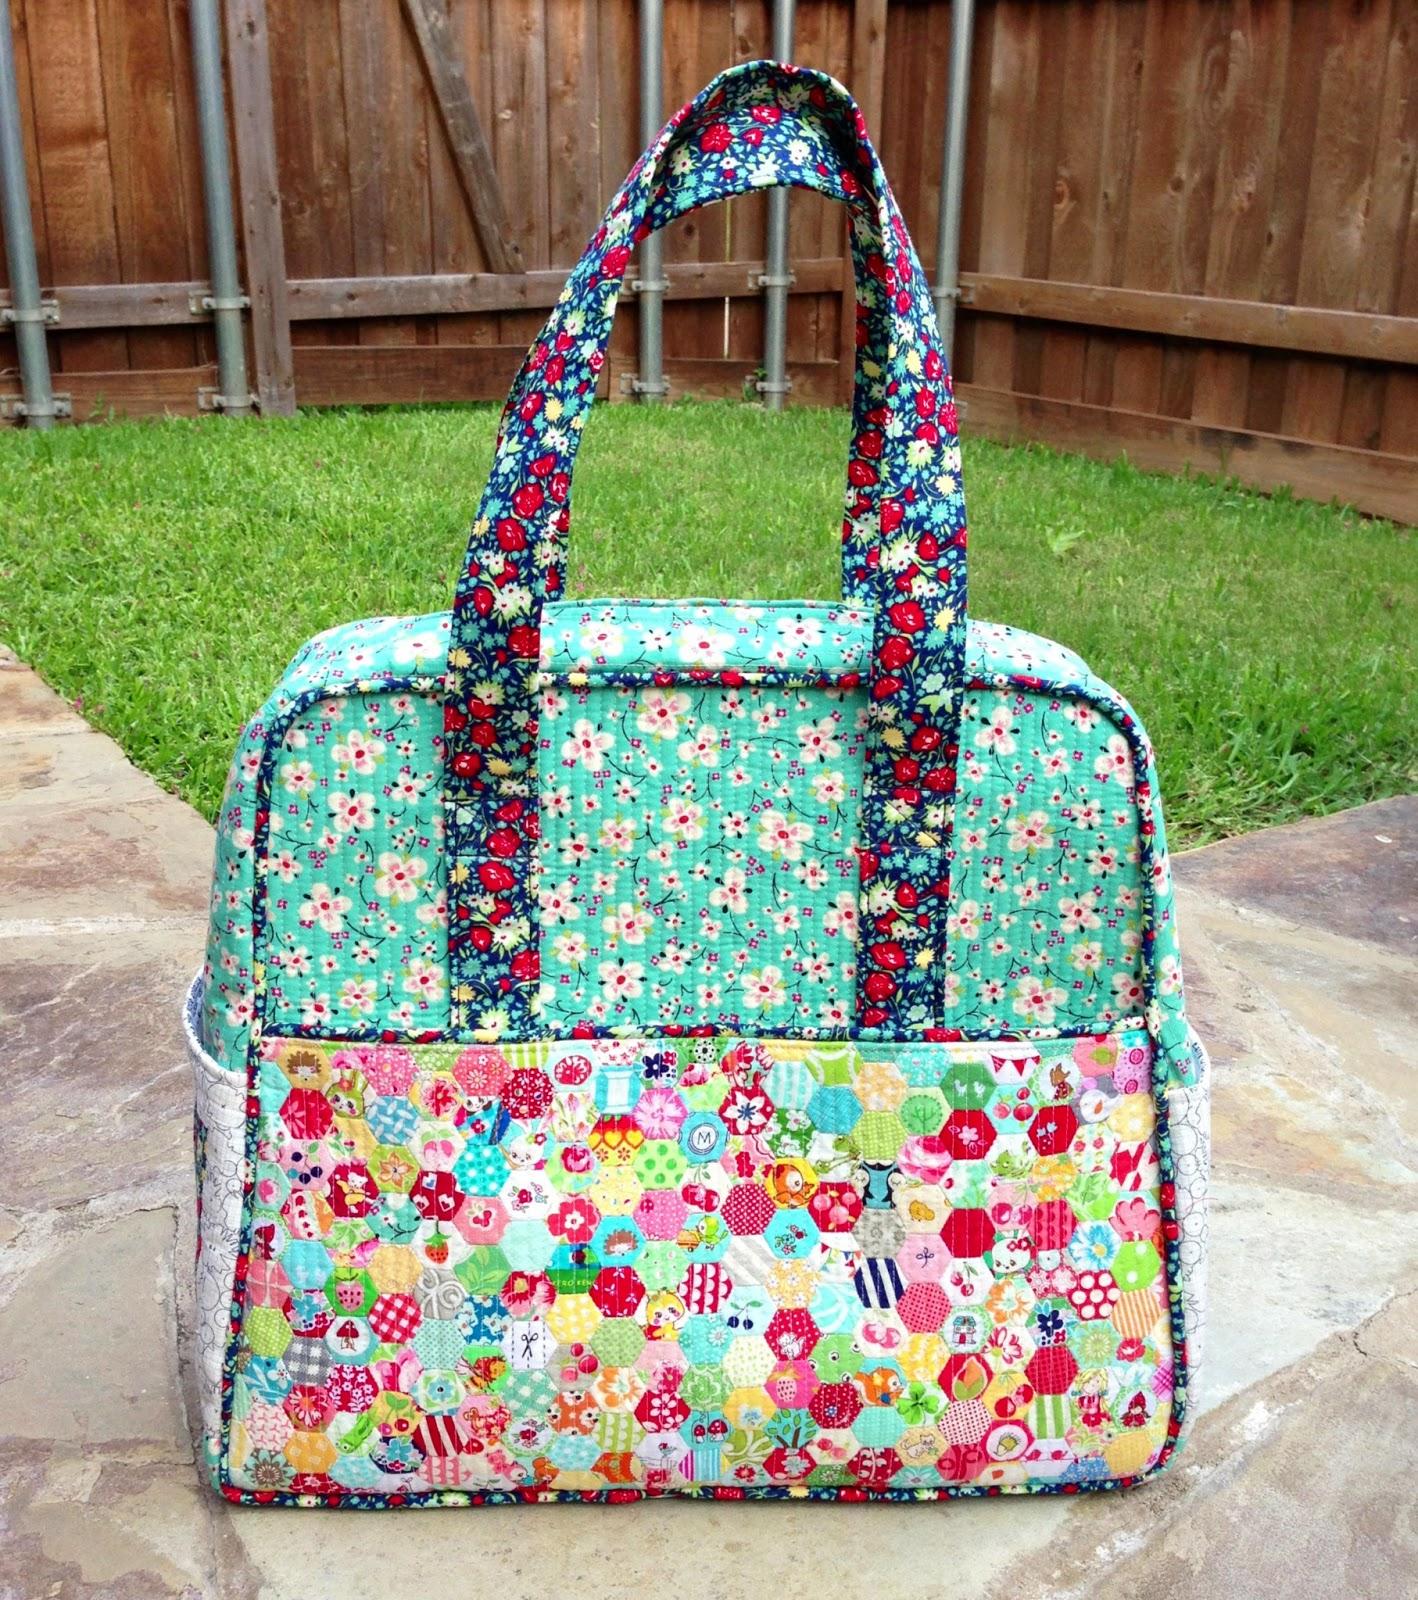 Three Owls Handmade: Weekender Bag Tips and Modifications - Part 1 ... : quilted weekender bag - Adamdwight.com